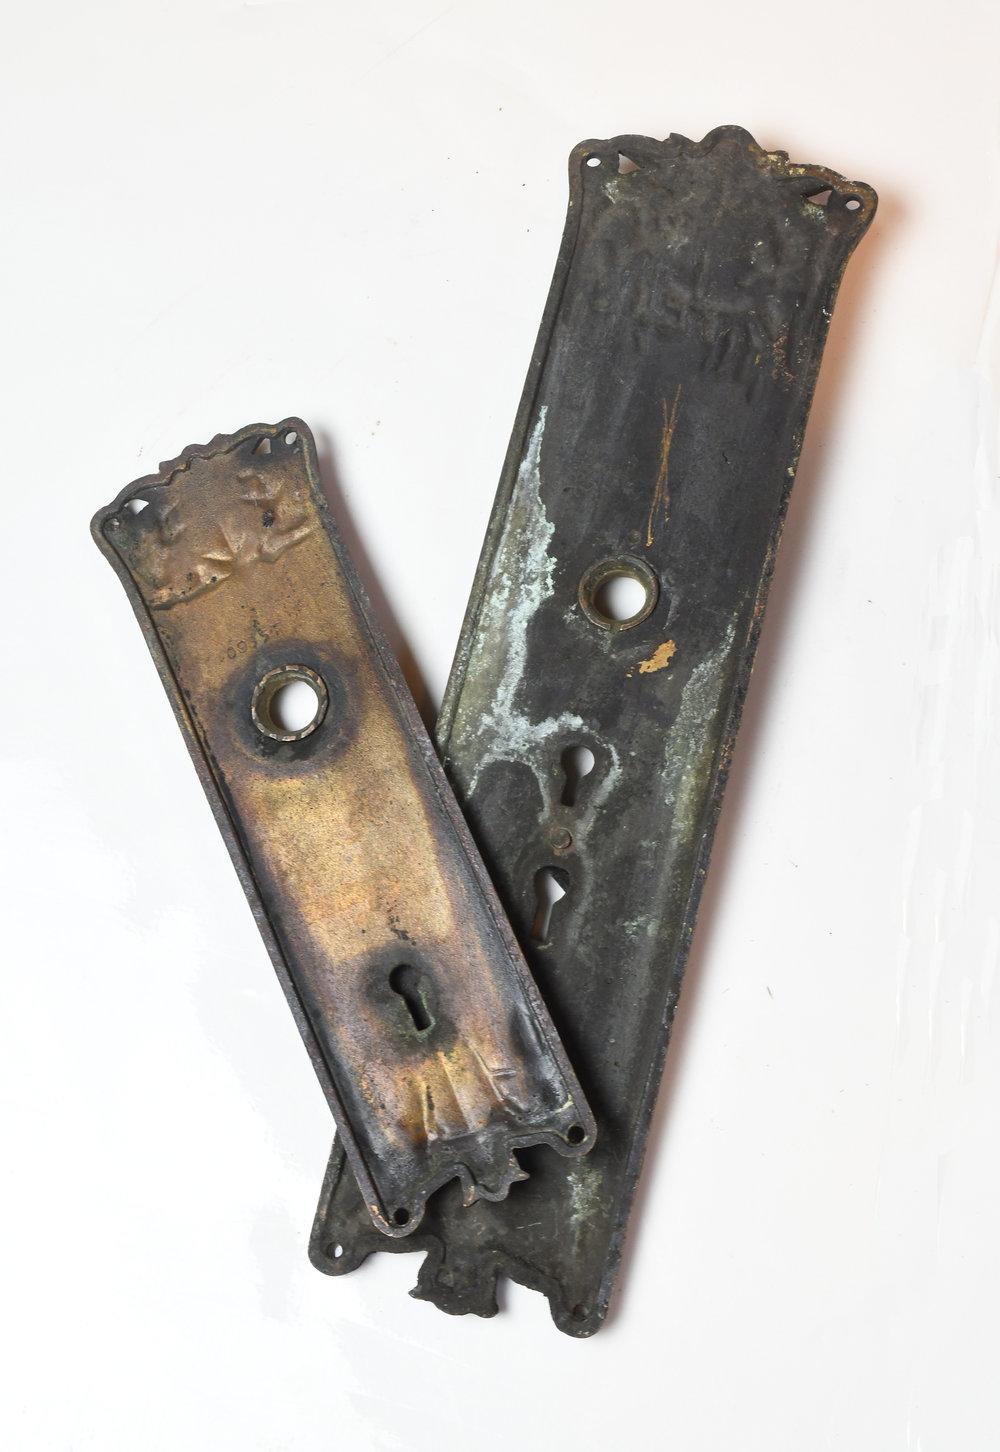 H20169-cast-brass-corbin-florence-door-knob-set-both-back-1.jpg